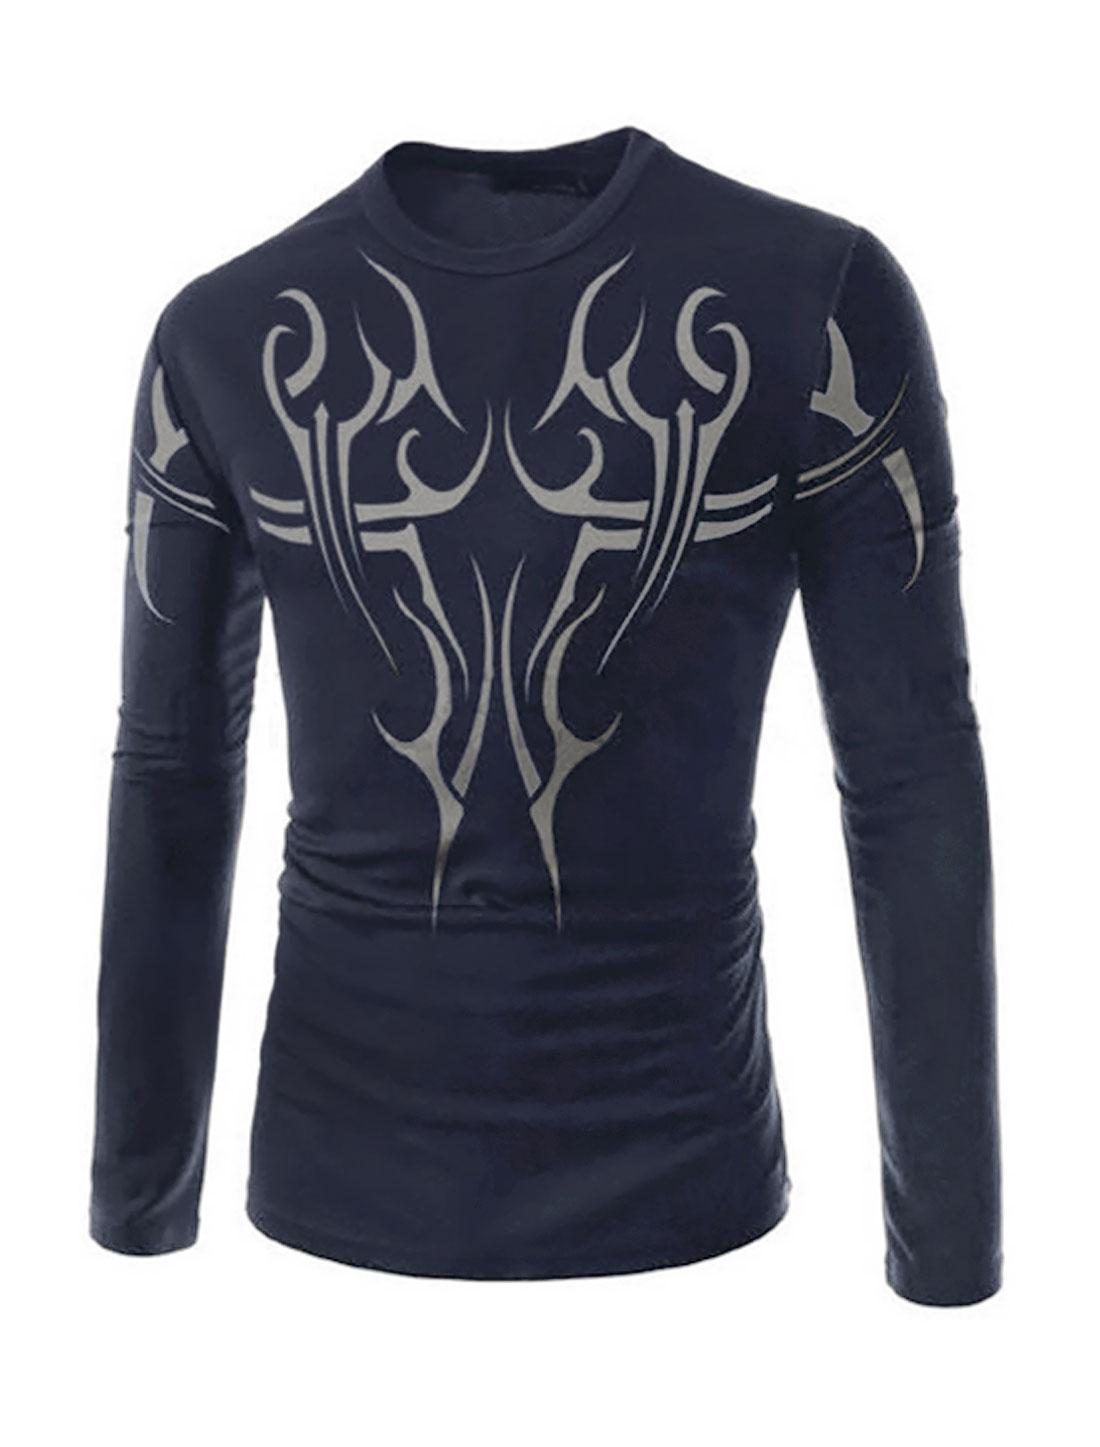 Men Round Neck Novelty Prints Long Sleeve Slim Fit Tee Shirt Blue M